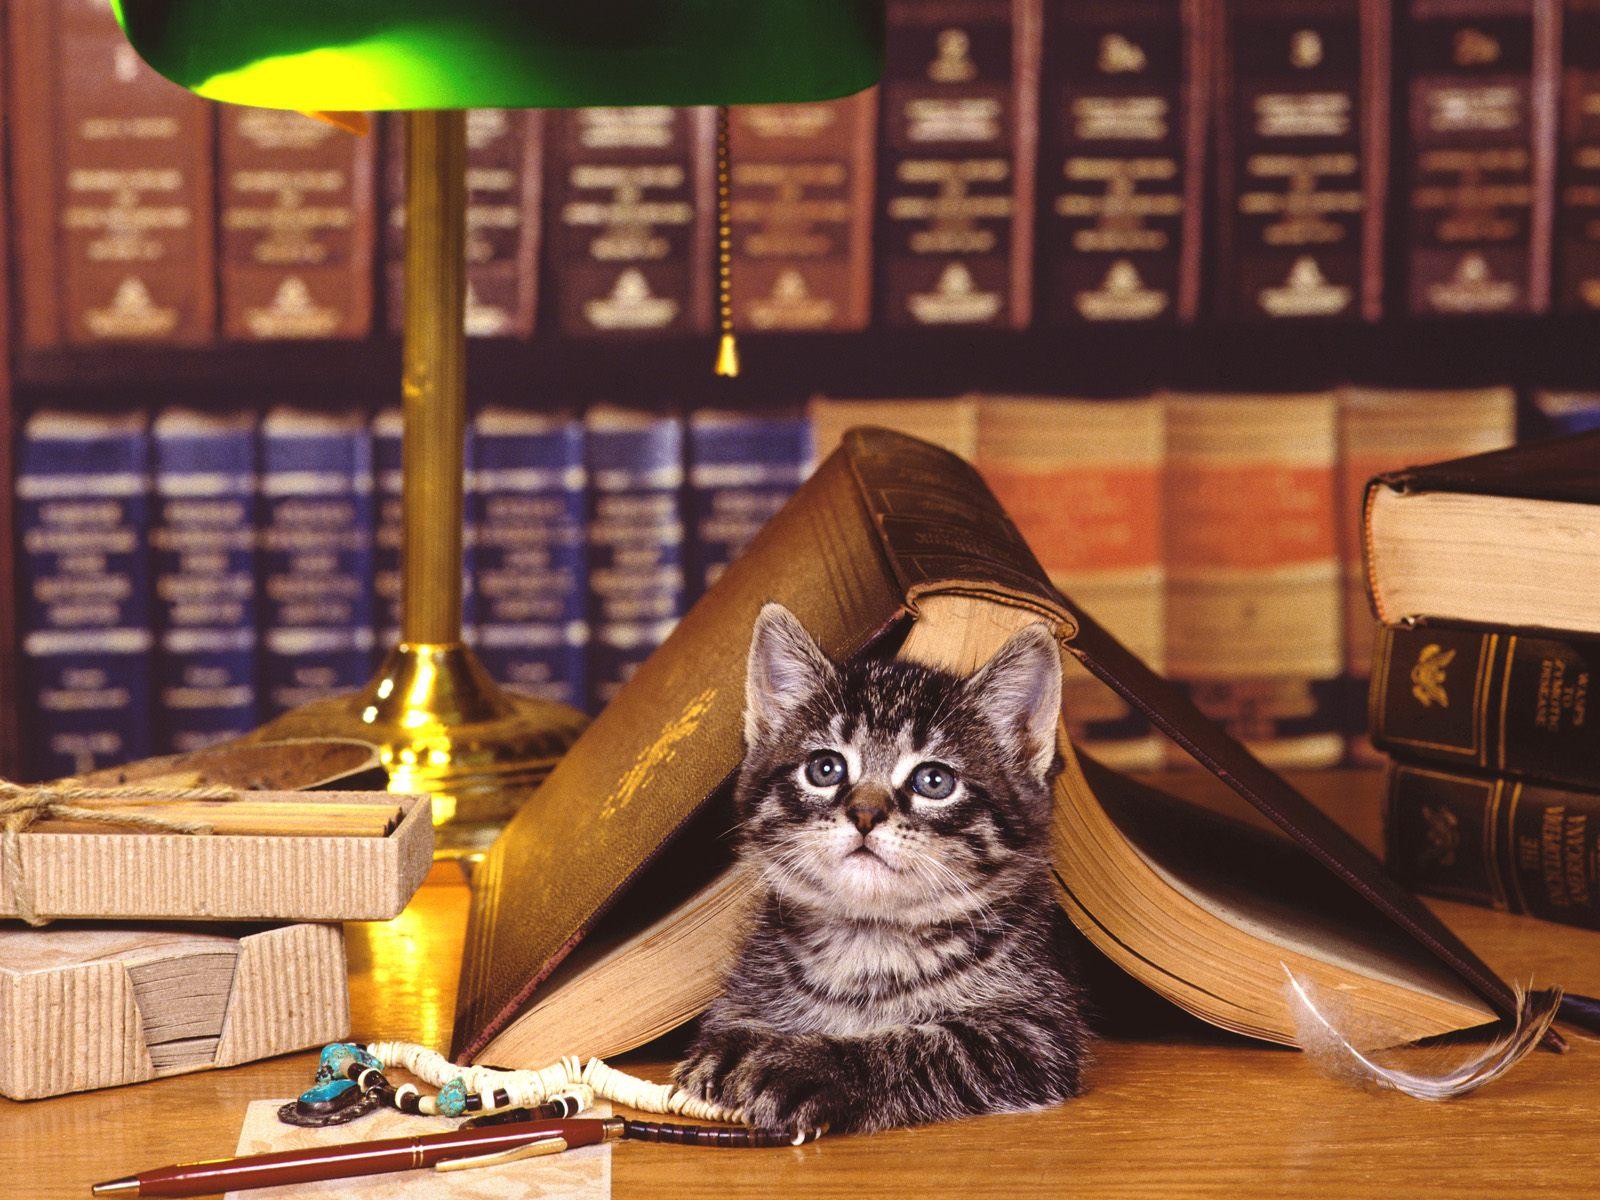 Books   Cats Photography Desktop Wallpapers 5536 Views 1600x1200